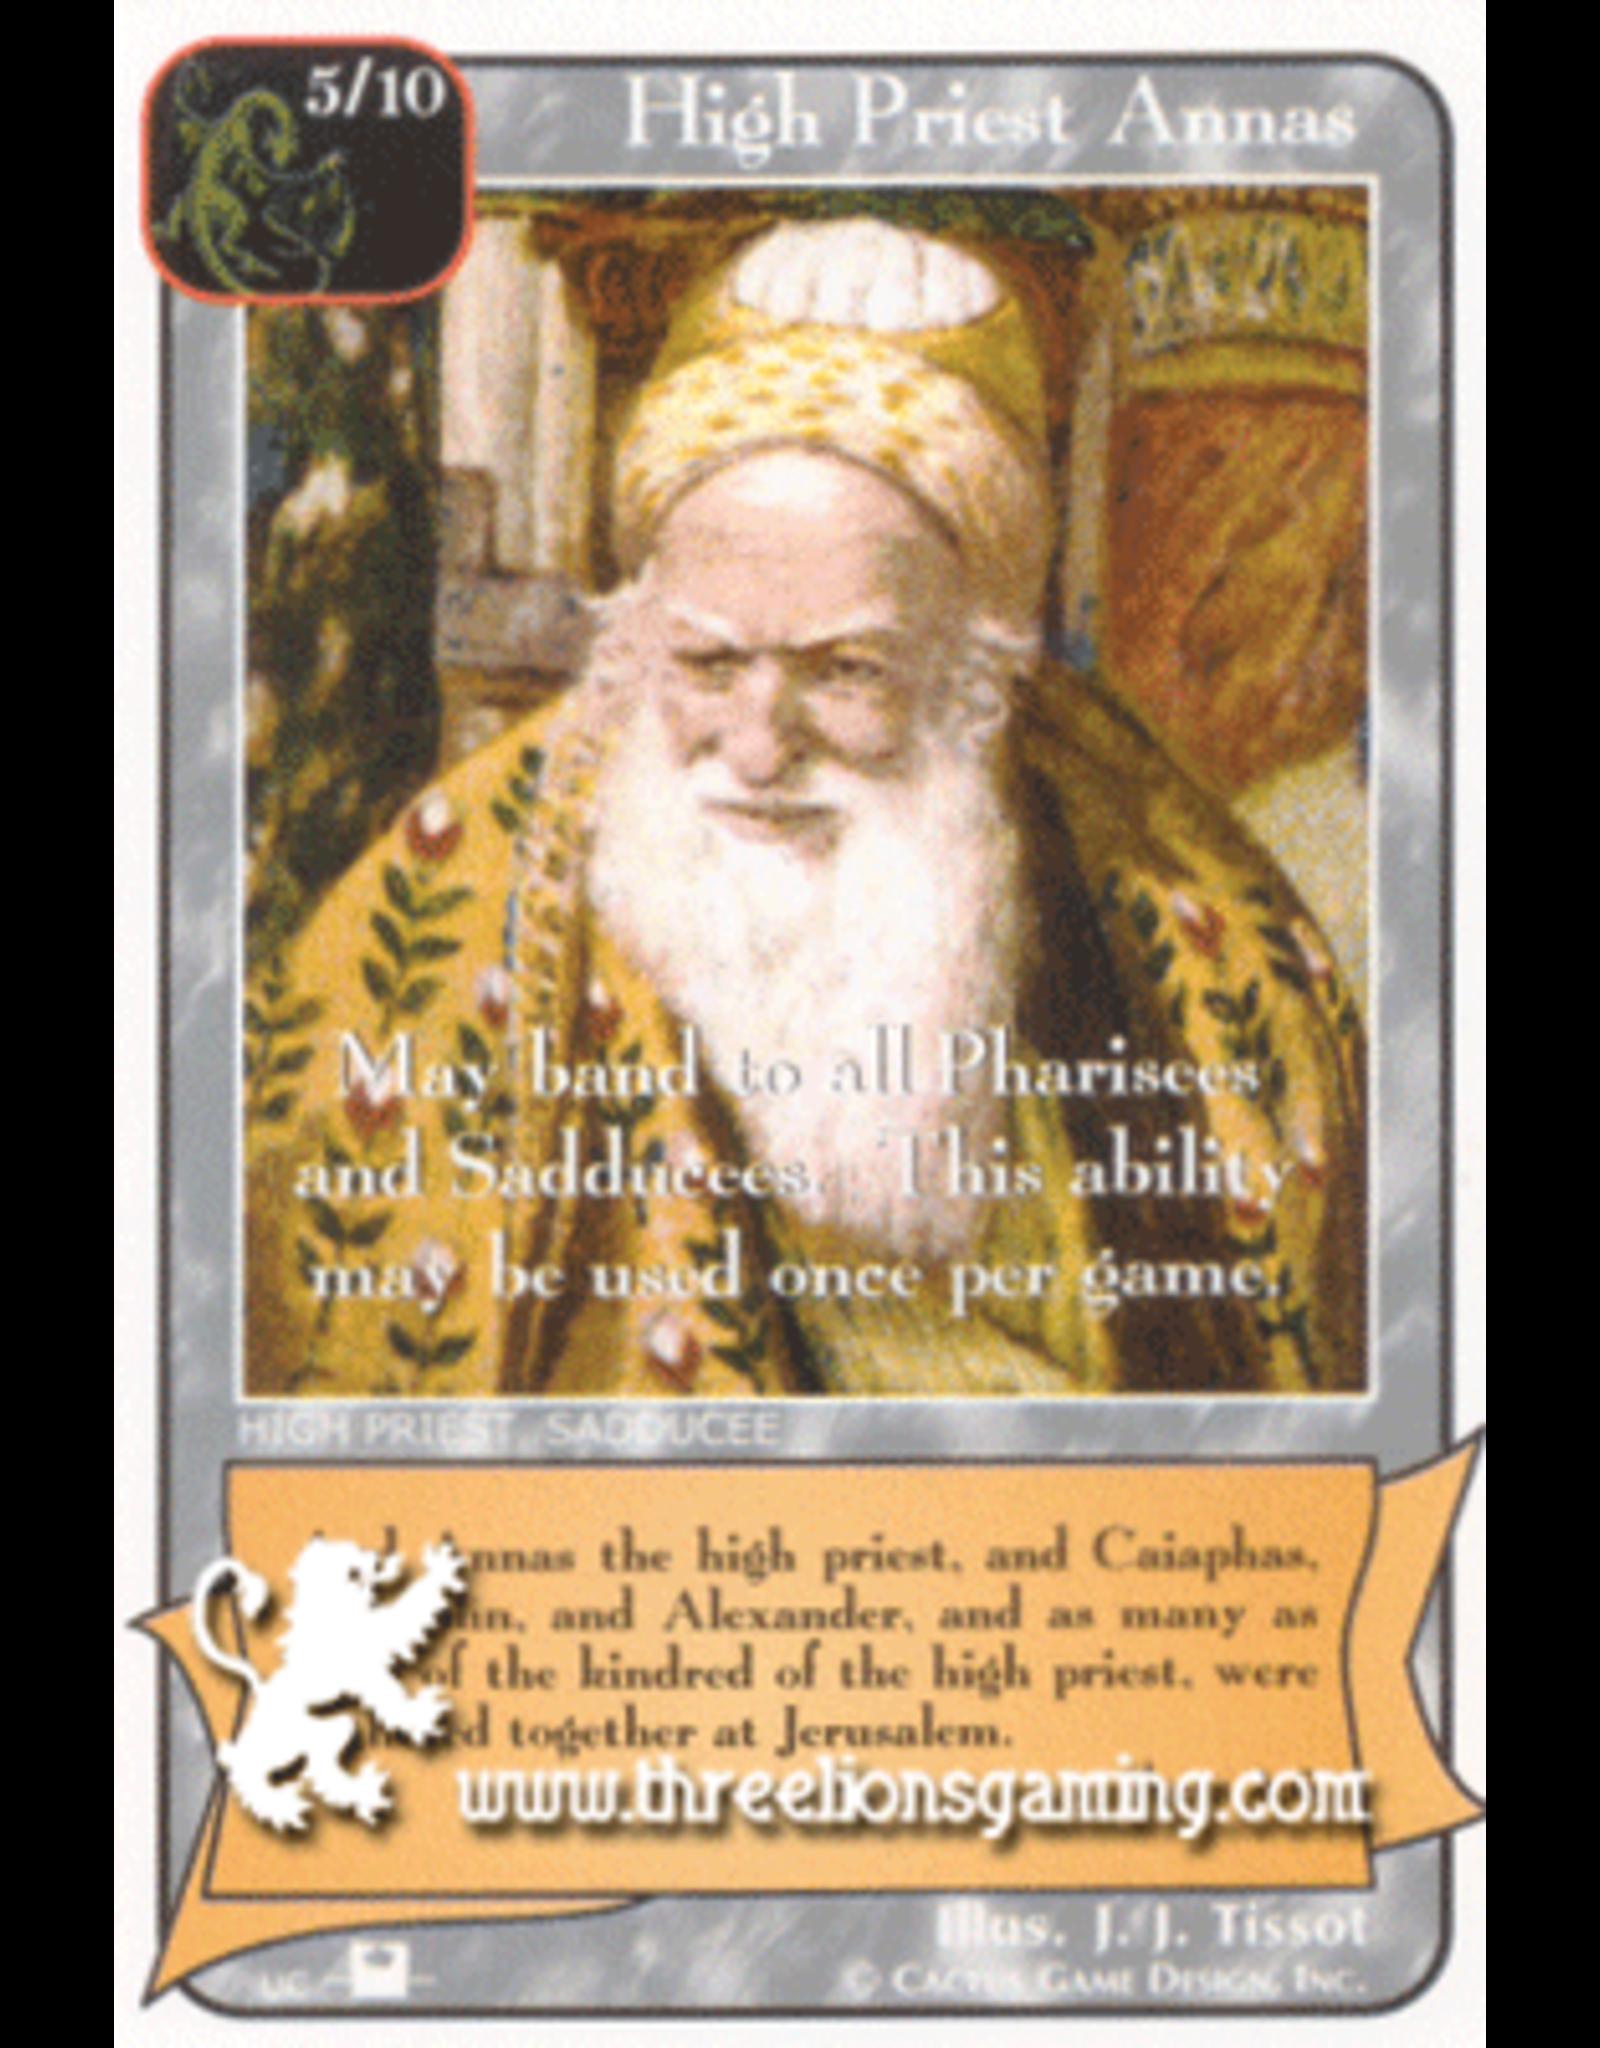 Priests: High Priest Annas